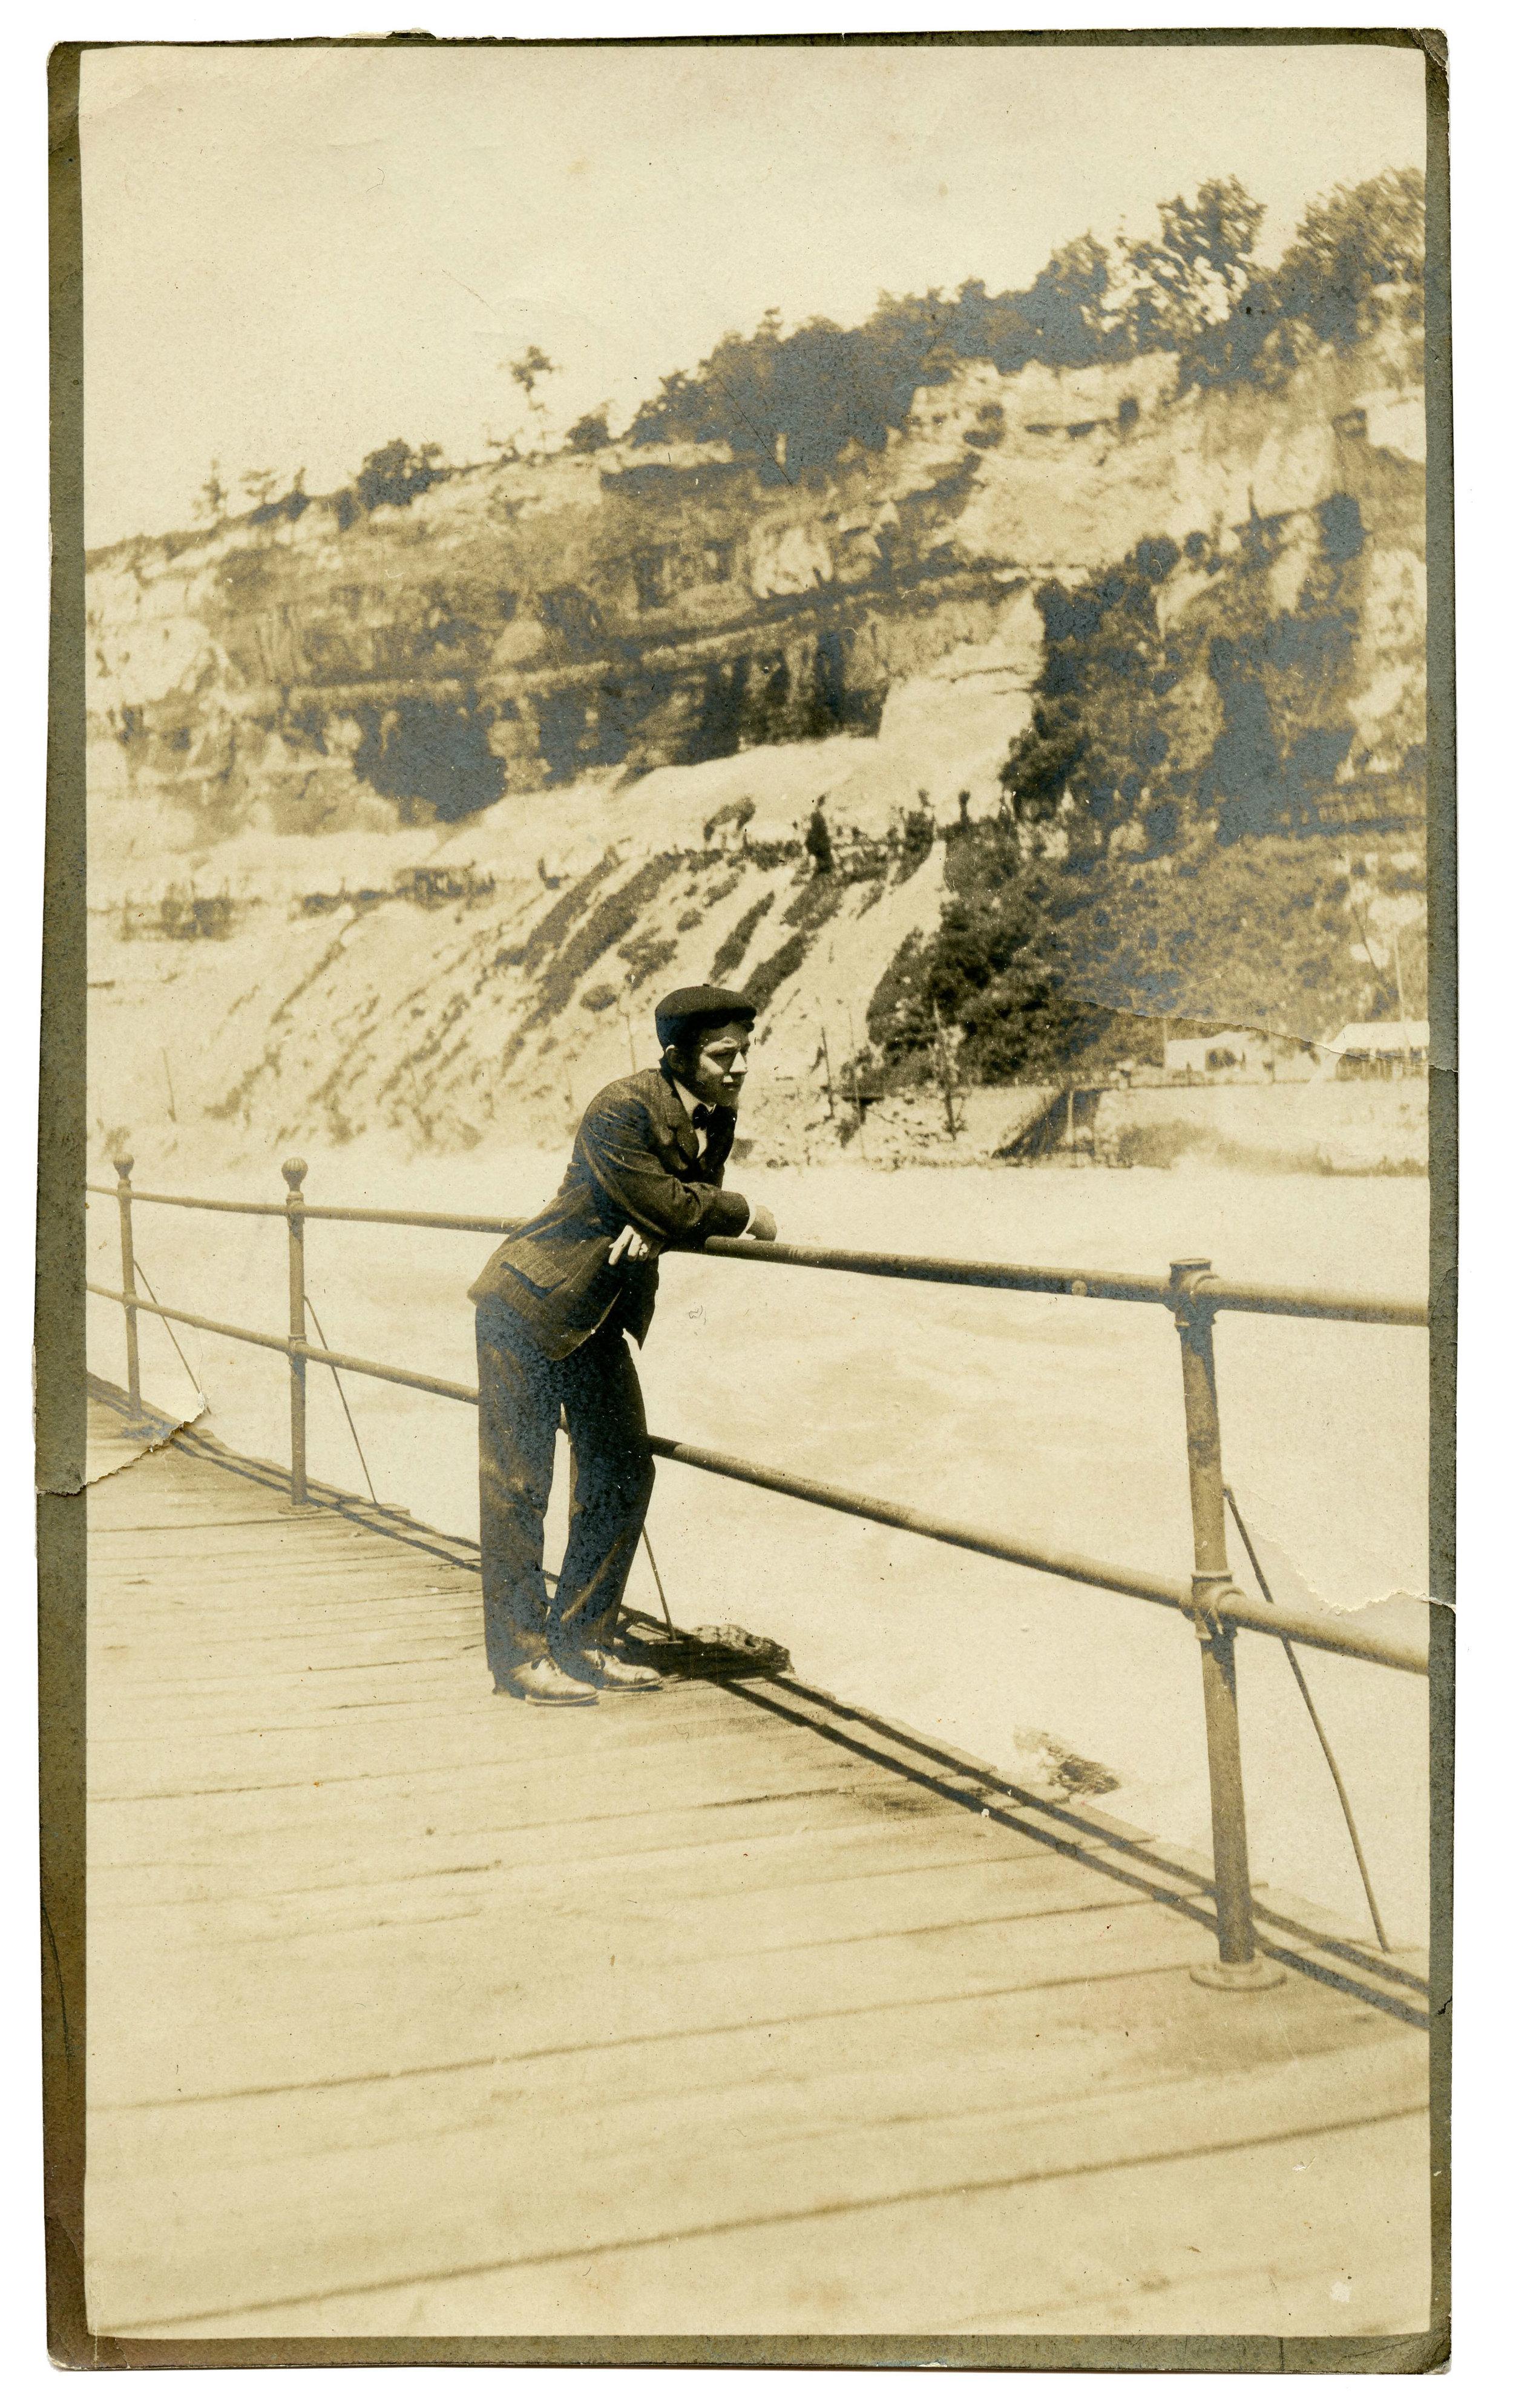 """Edgar - Taken at the falls - 1912"" B&W print, 1912, 5.75"" x 3.5"" Found in Philadelphia, PA"